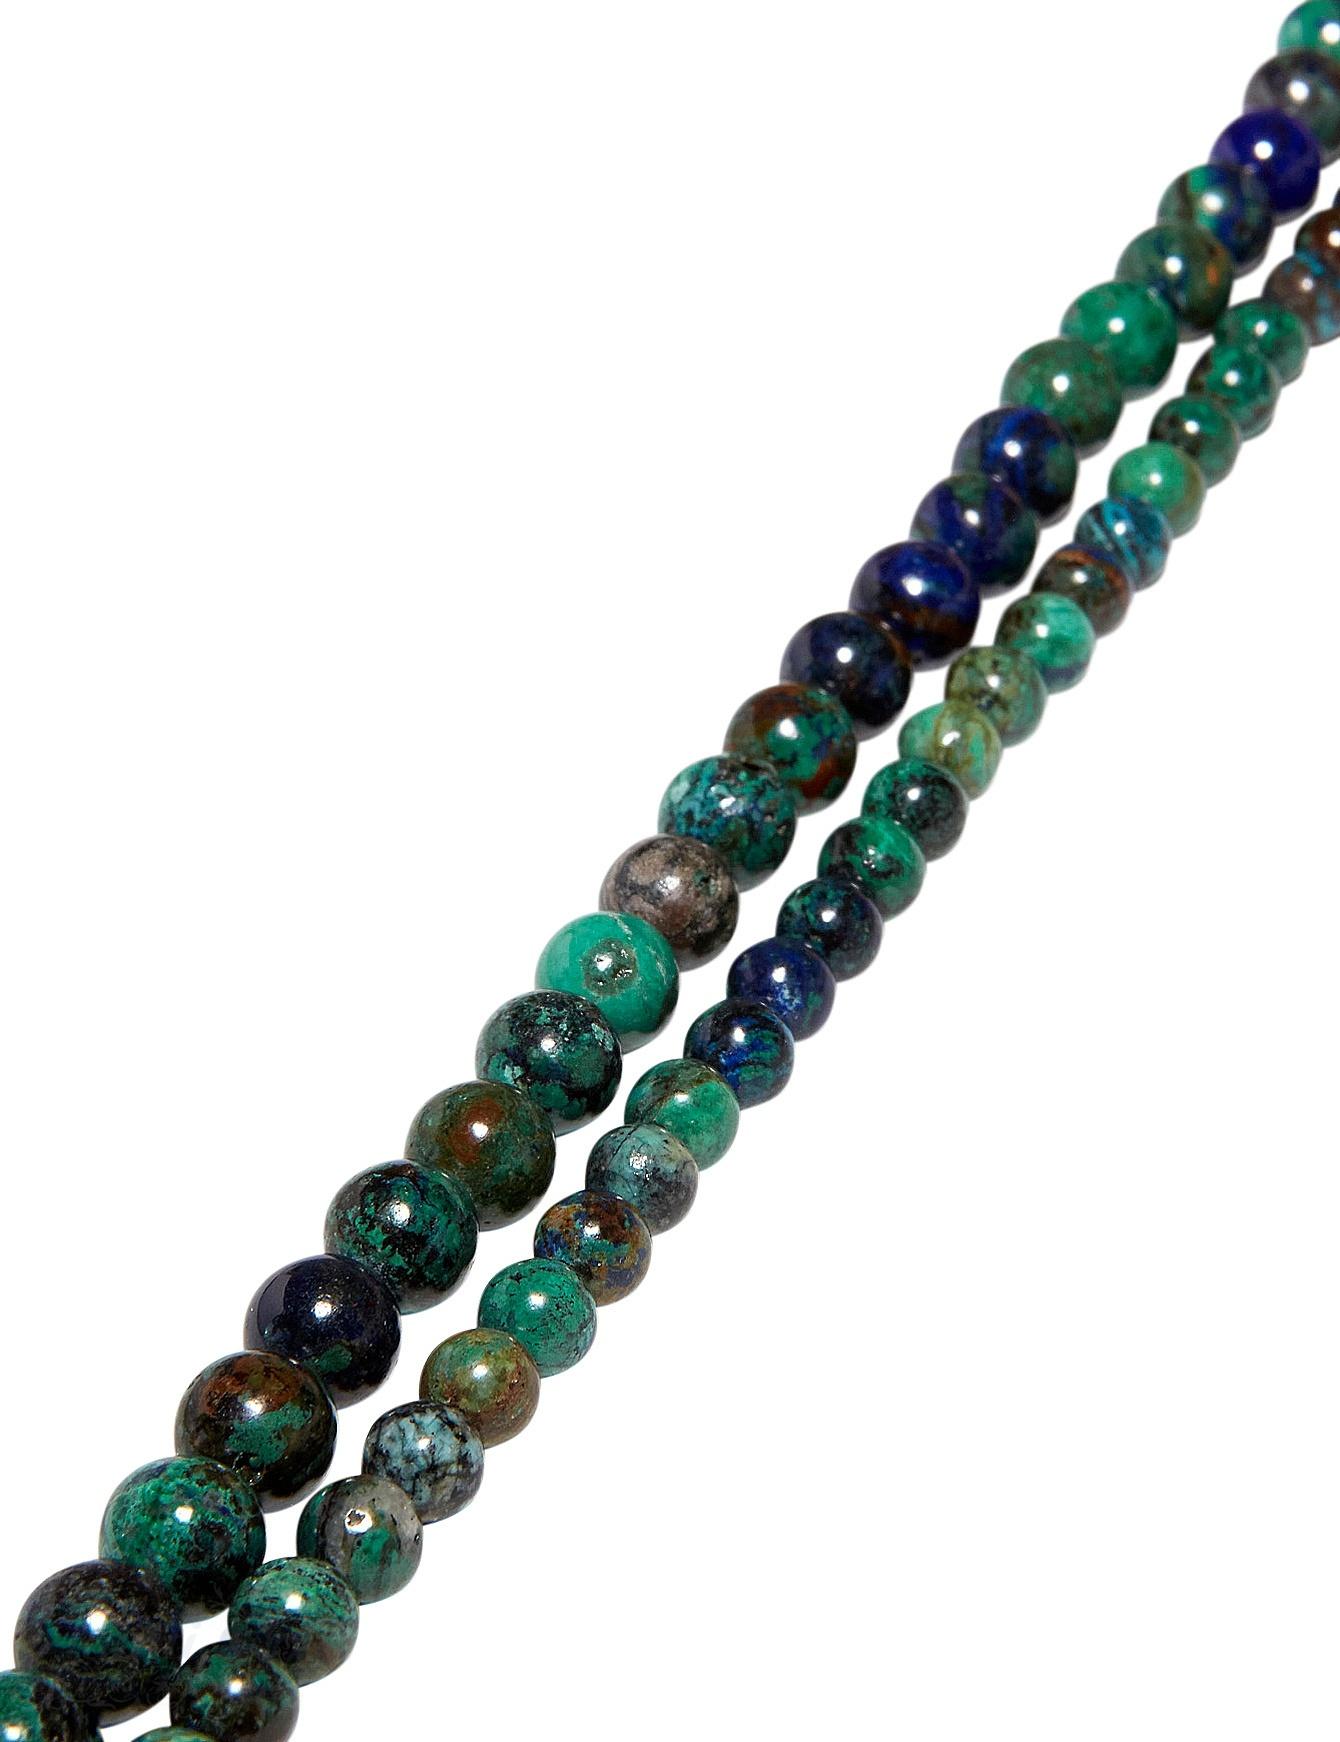 Azurit-Malachit Strang grün-blau poliert Kugeln AA